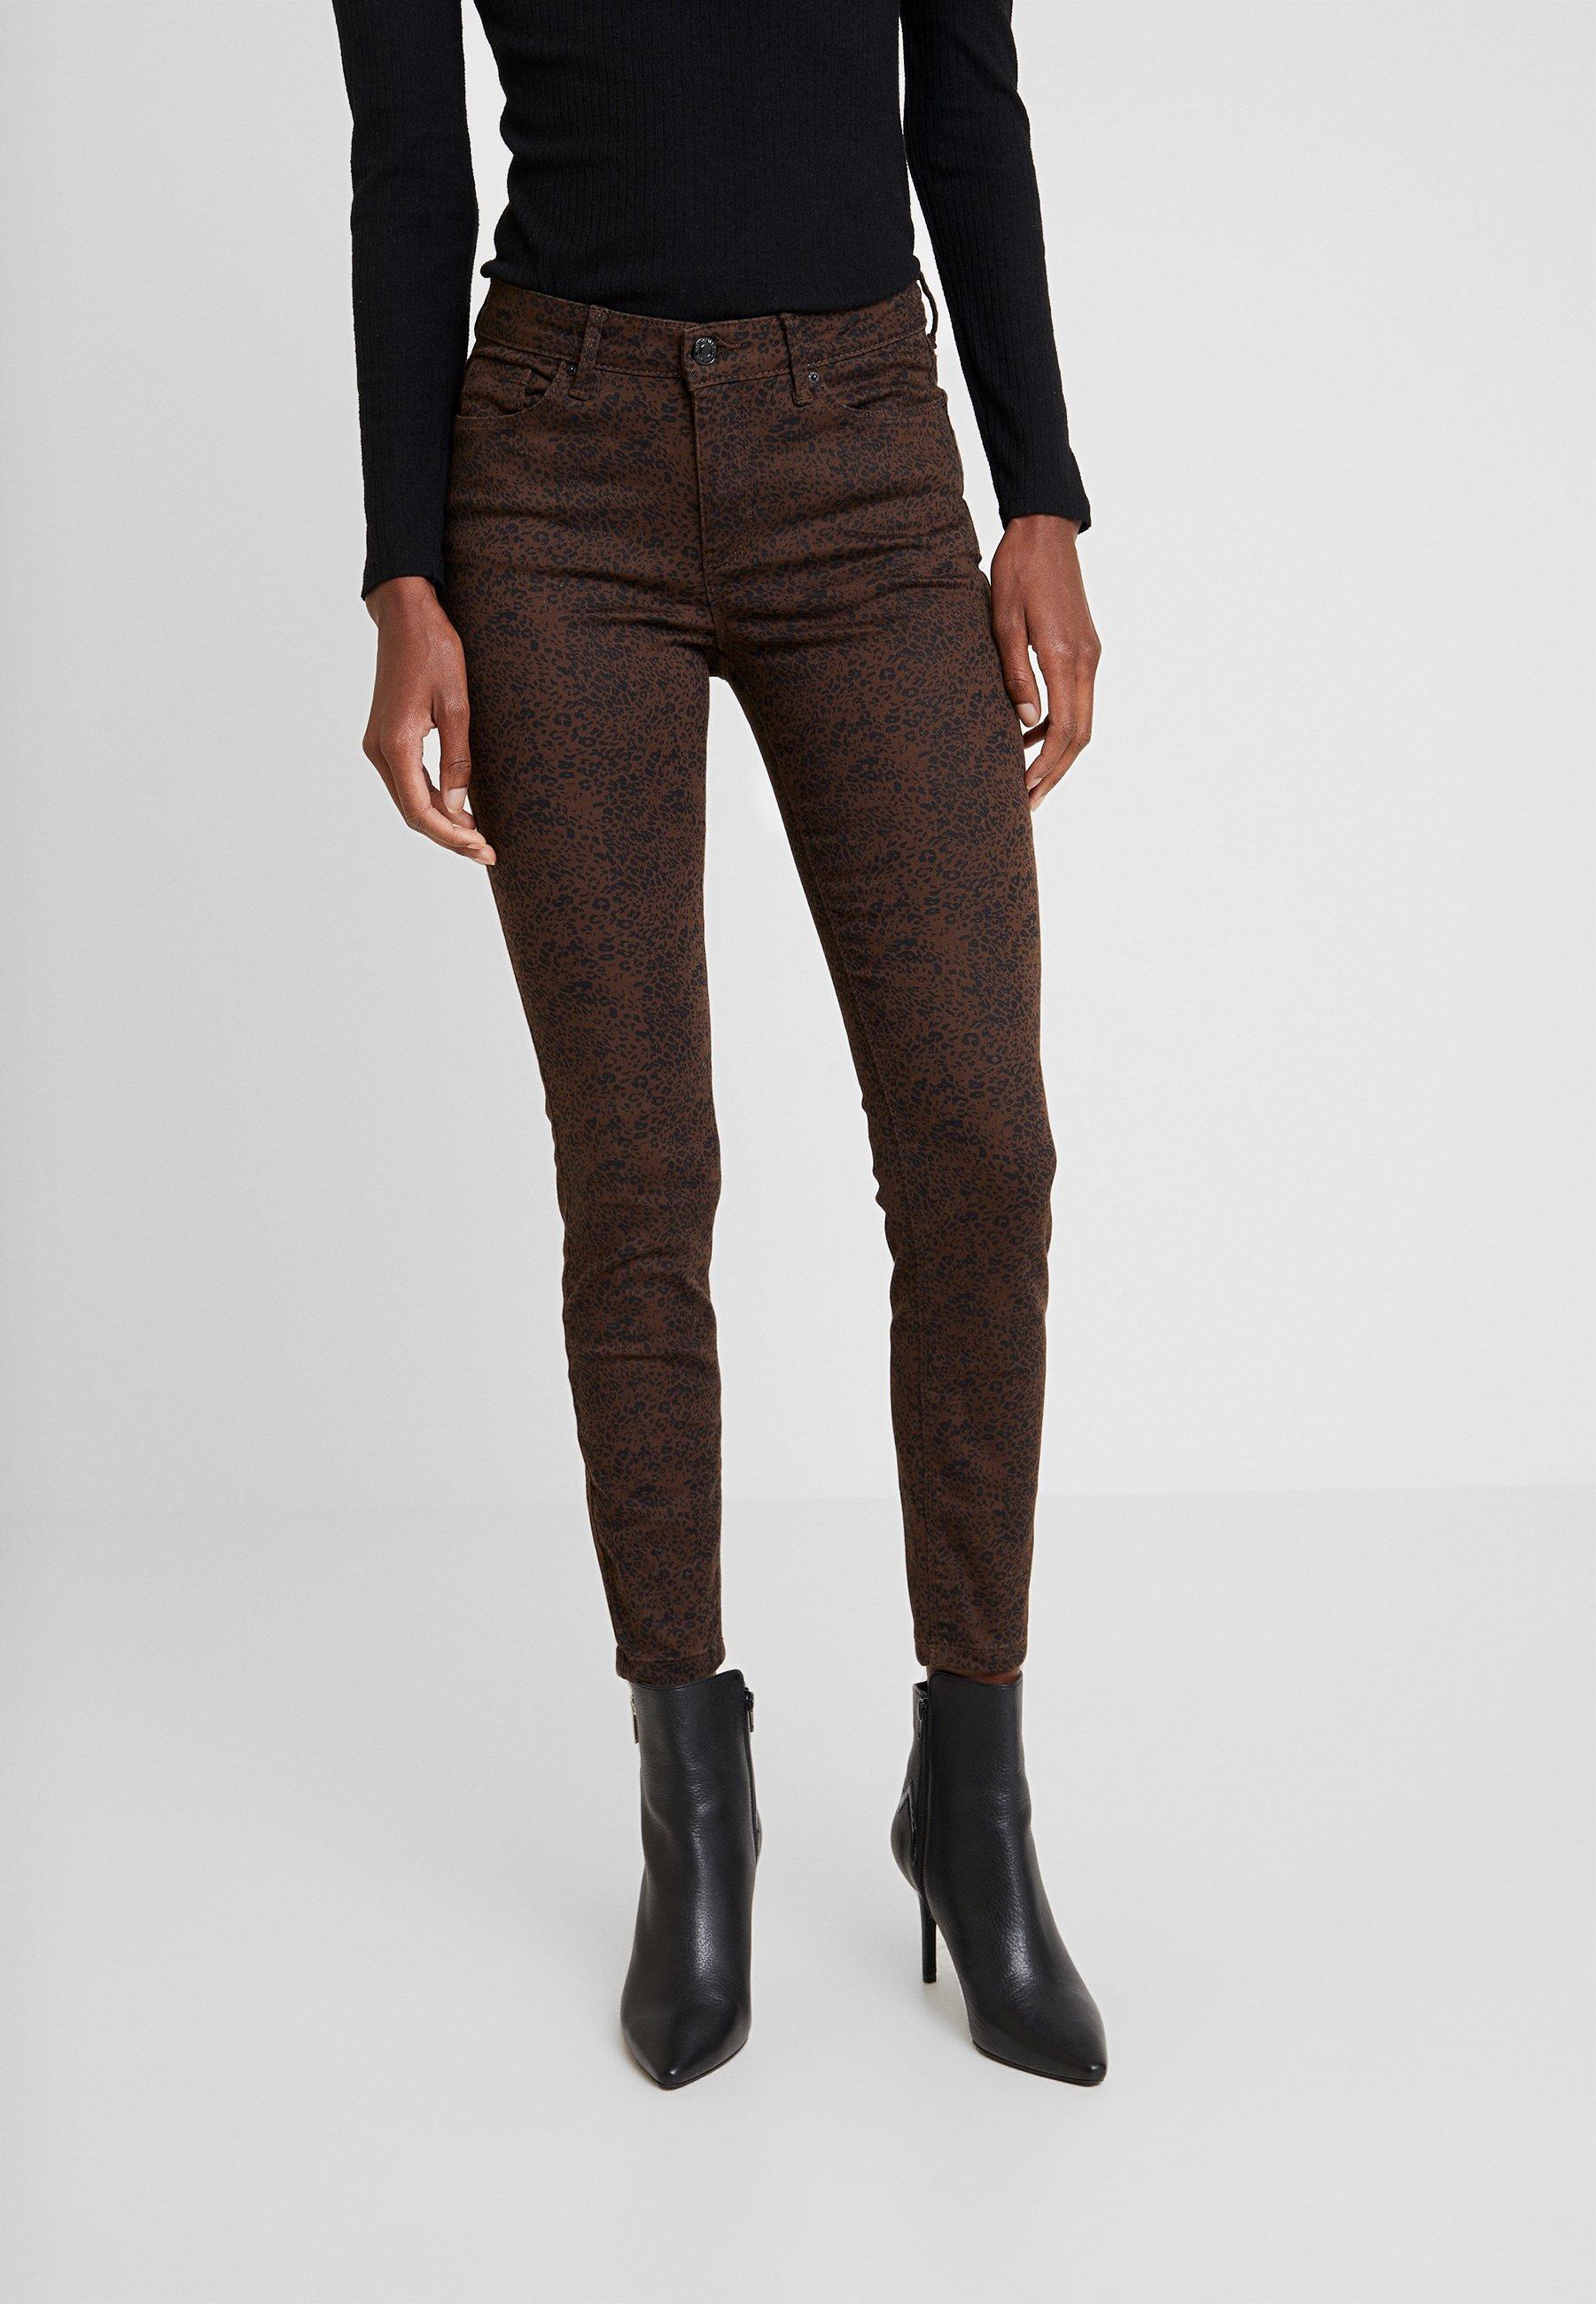 Gym Skinny Browns Springfield LeopardoJeans Sarga xthrdsQC